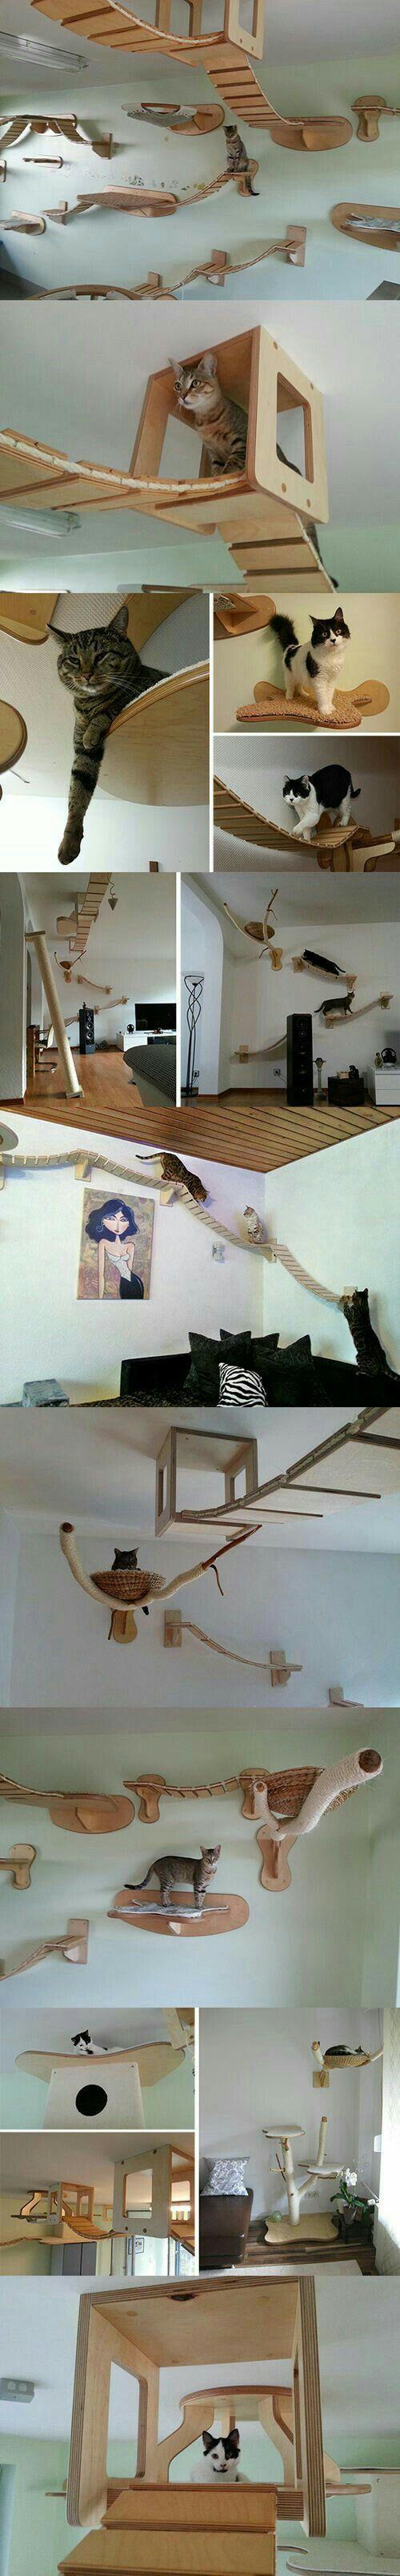 Cat friendly house designs